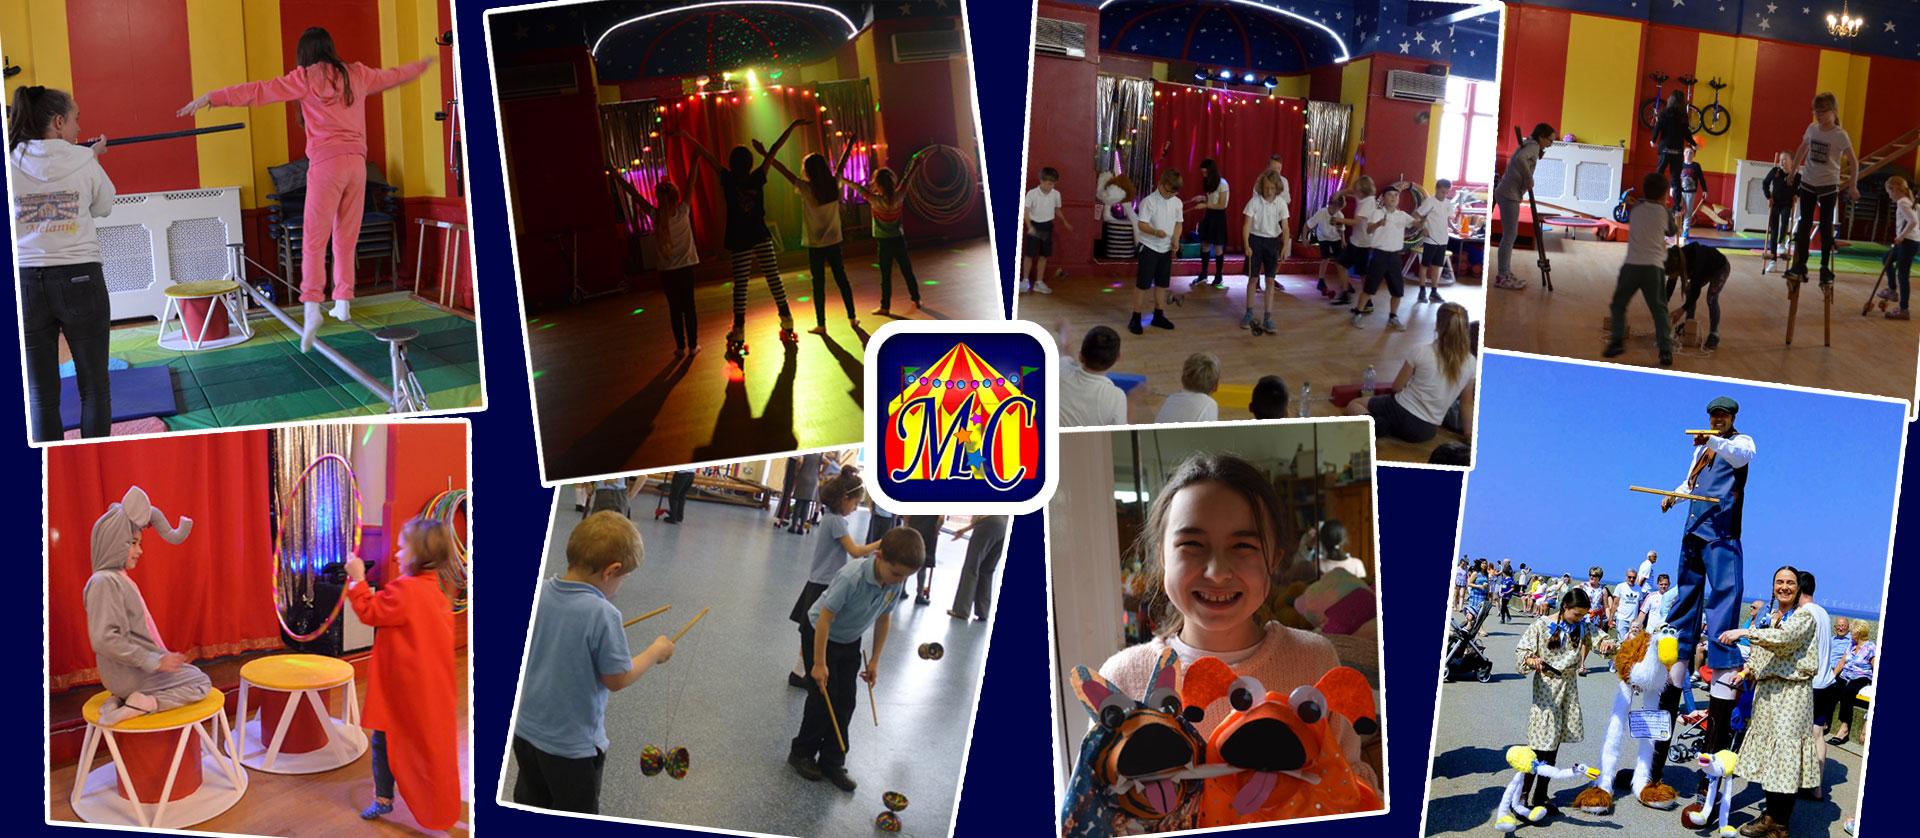 Circus skills workshops, children's birthday parties,team